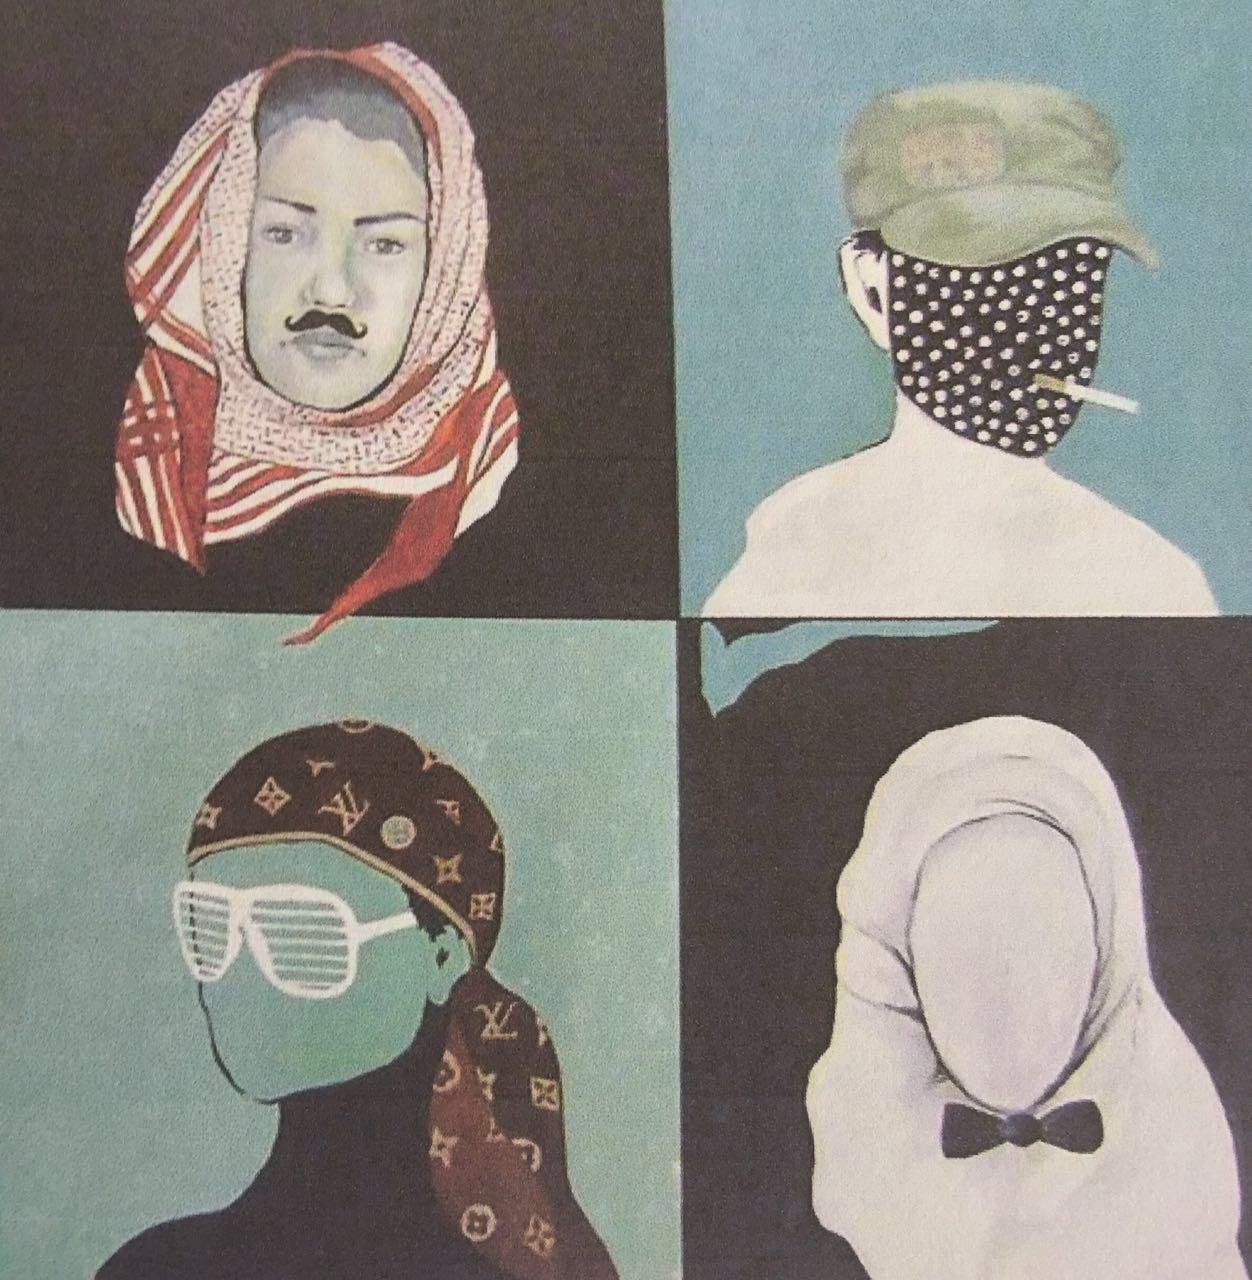 """The Saudi Muslim Communist Socialite Artist"" by Layla Mossallem."